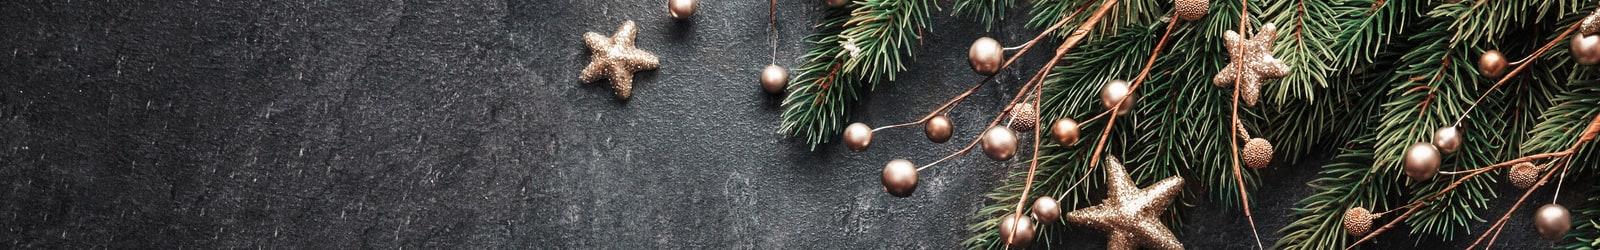 Christmas Lh Banner